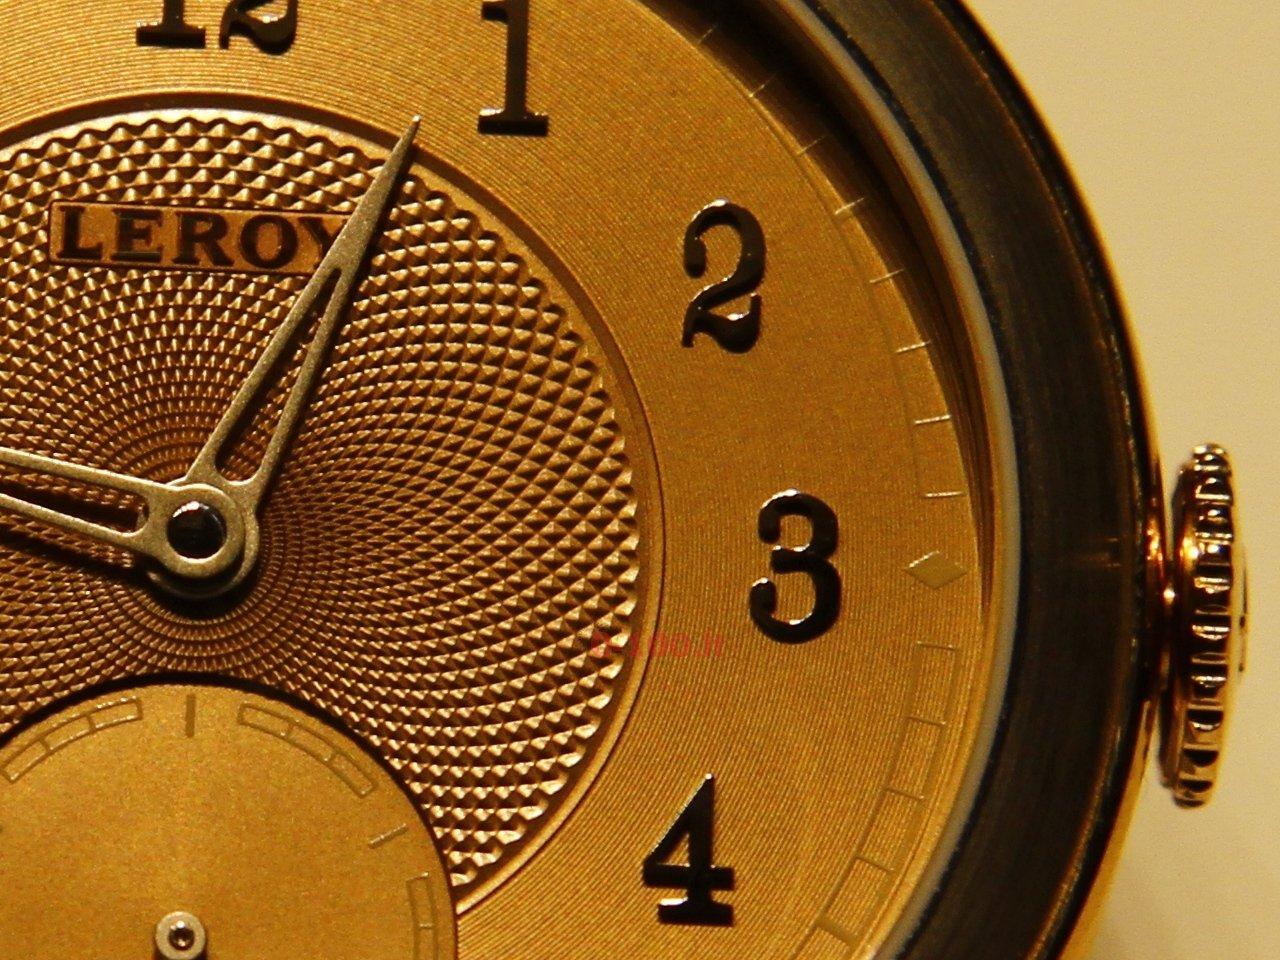 baselworld-2015_leroy-chronometer-l200-0-100-13